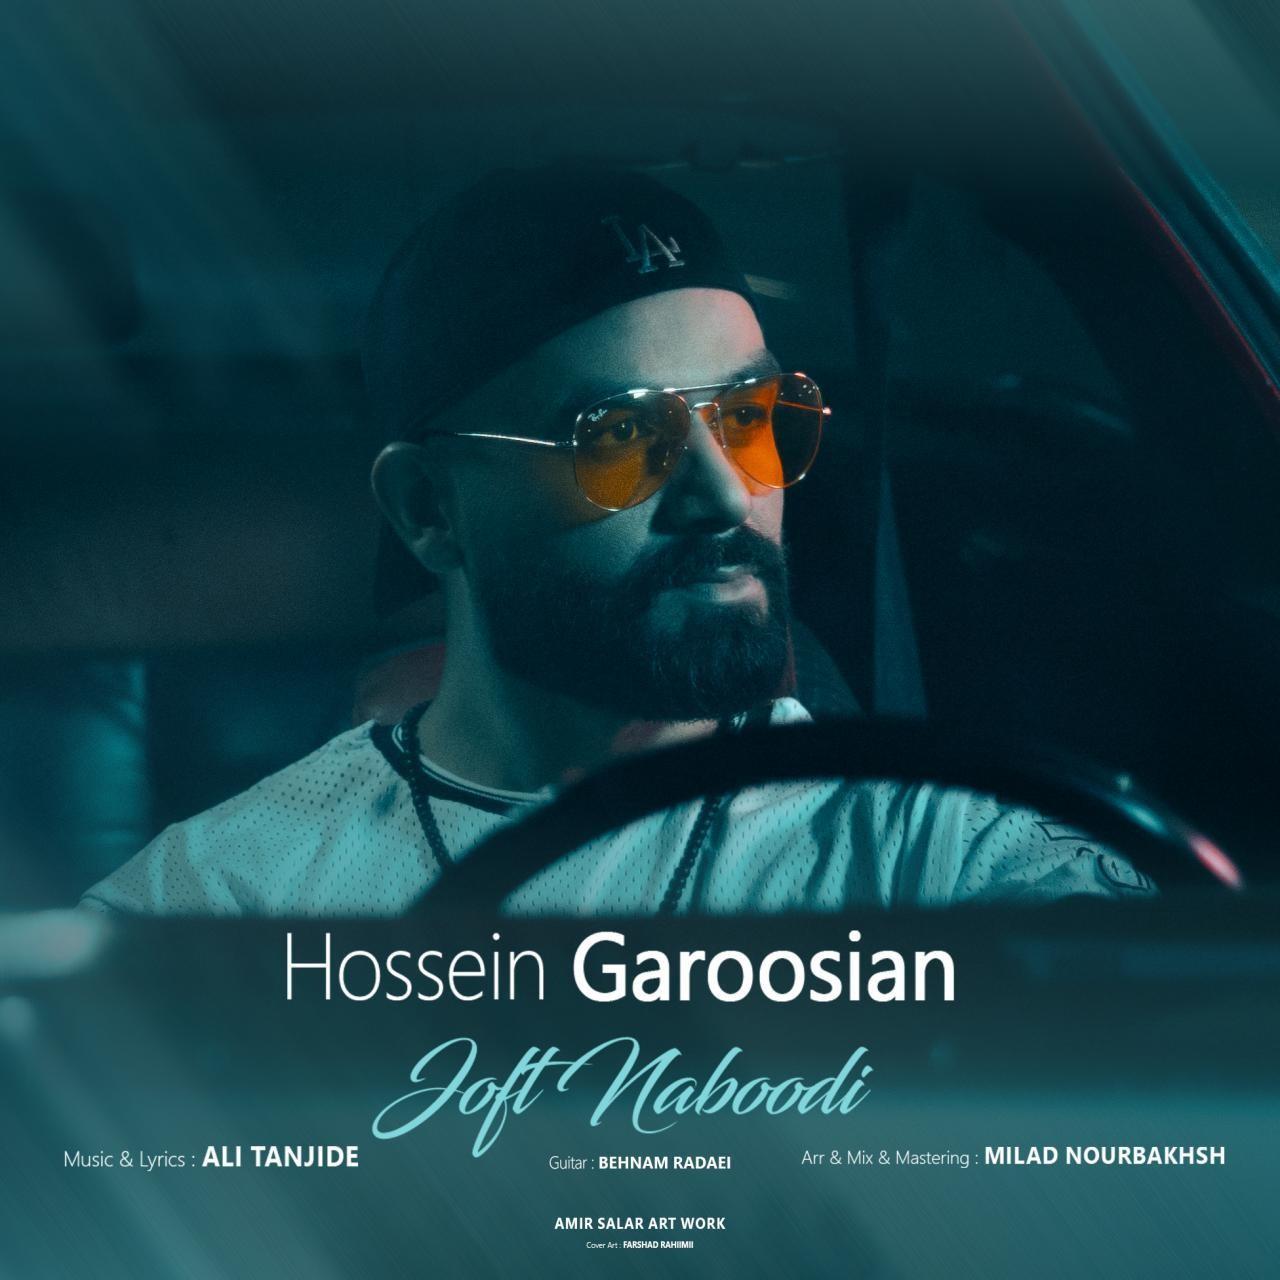 Hossein Garoosian – Joft Naboodi